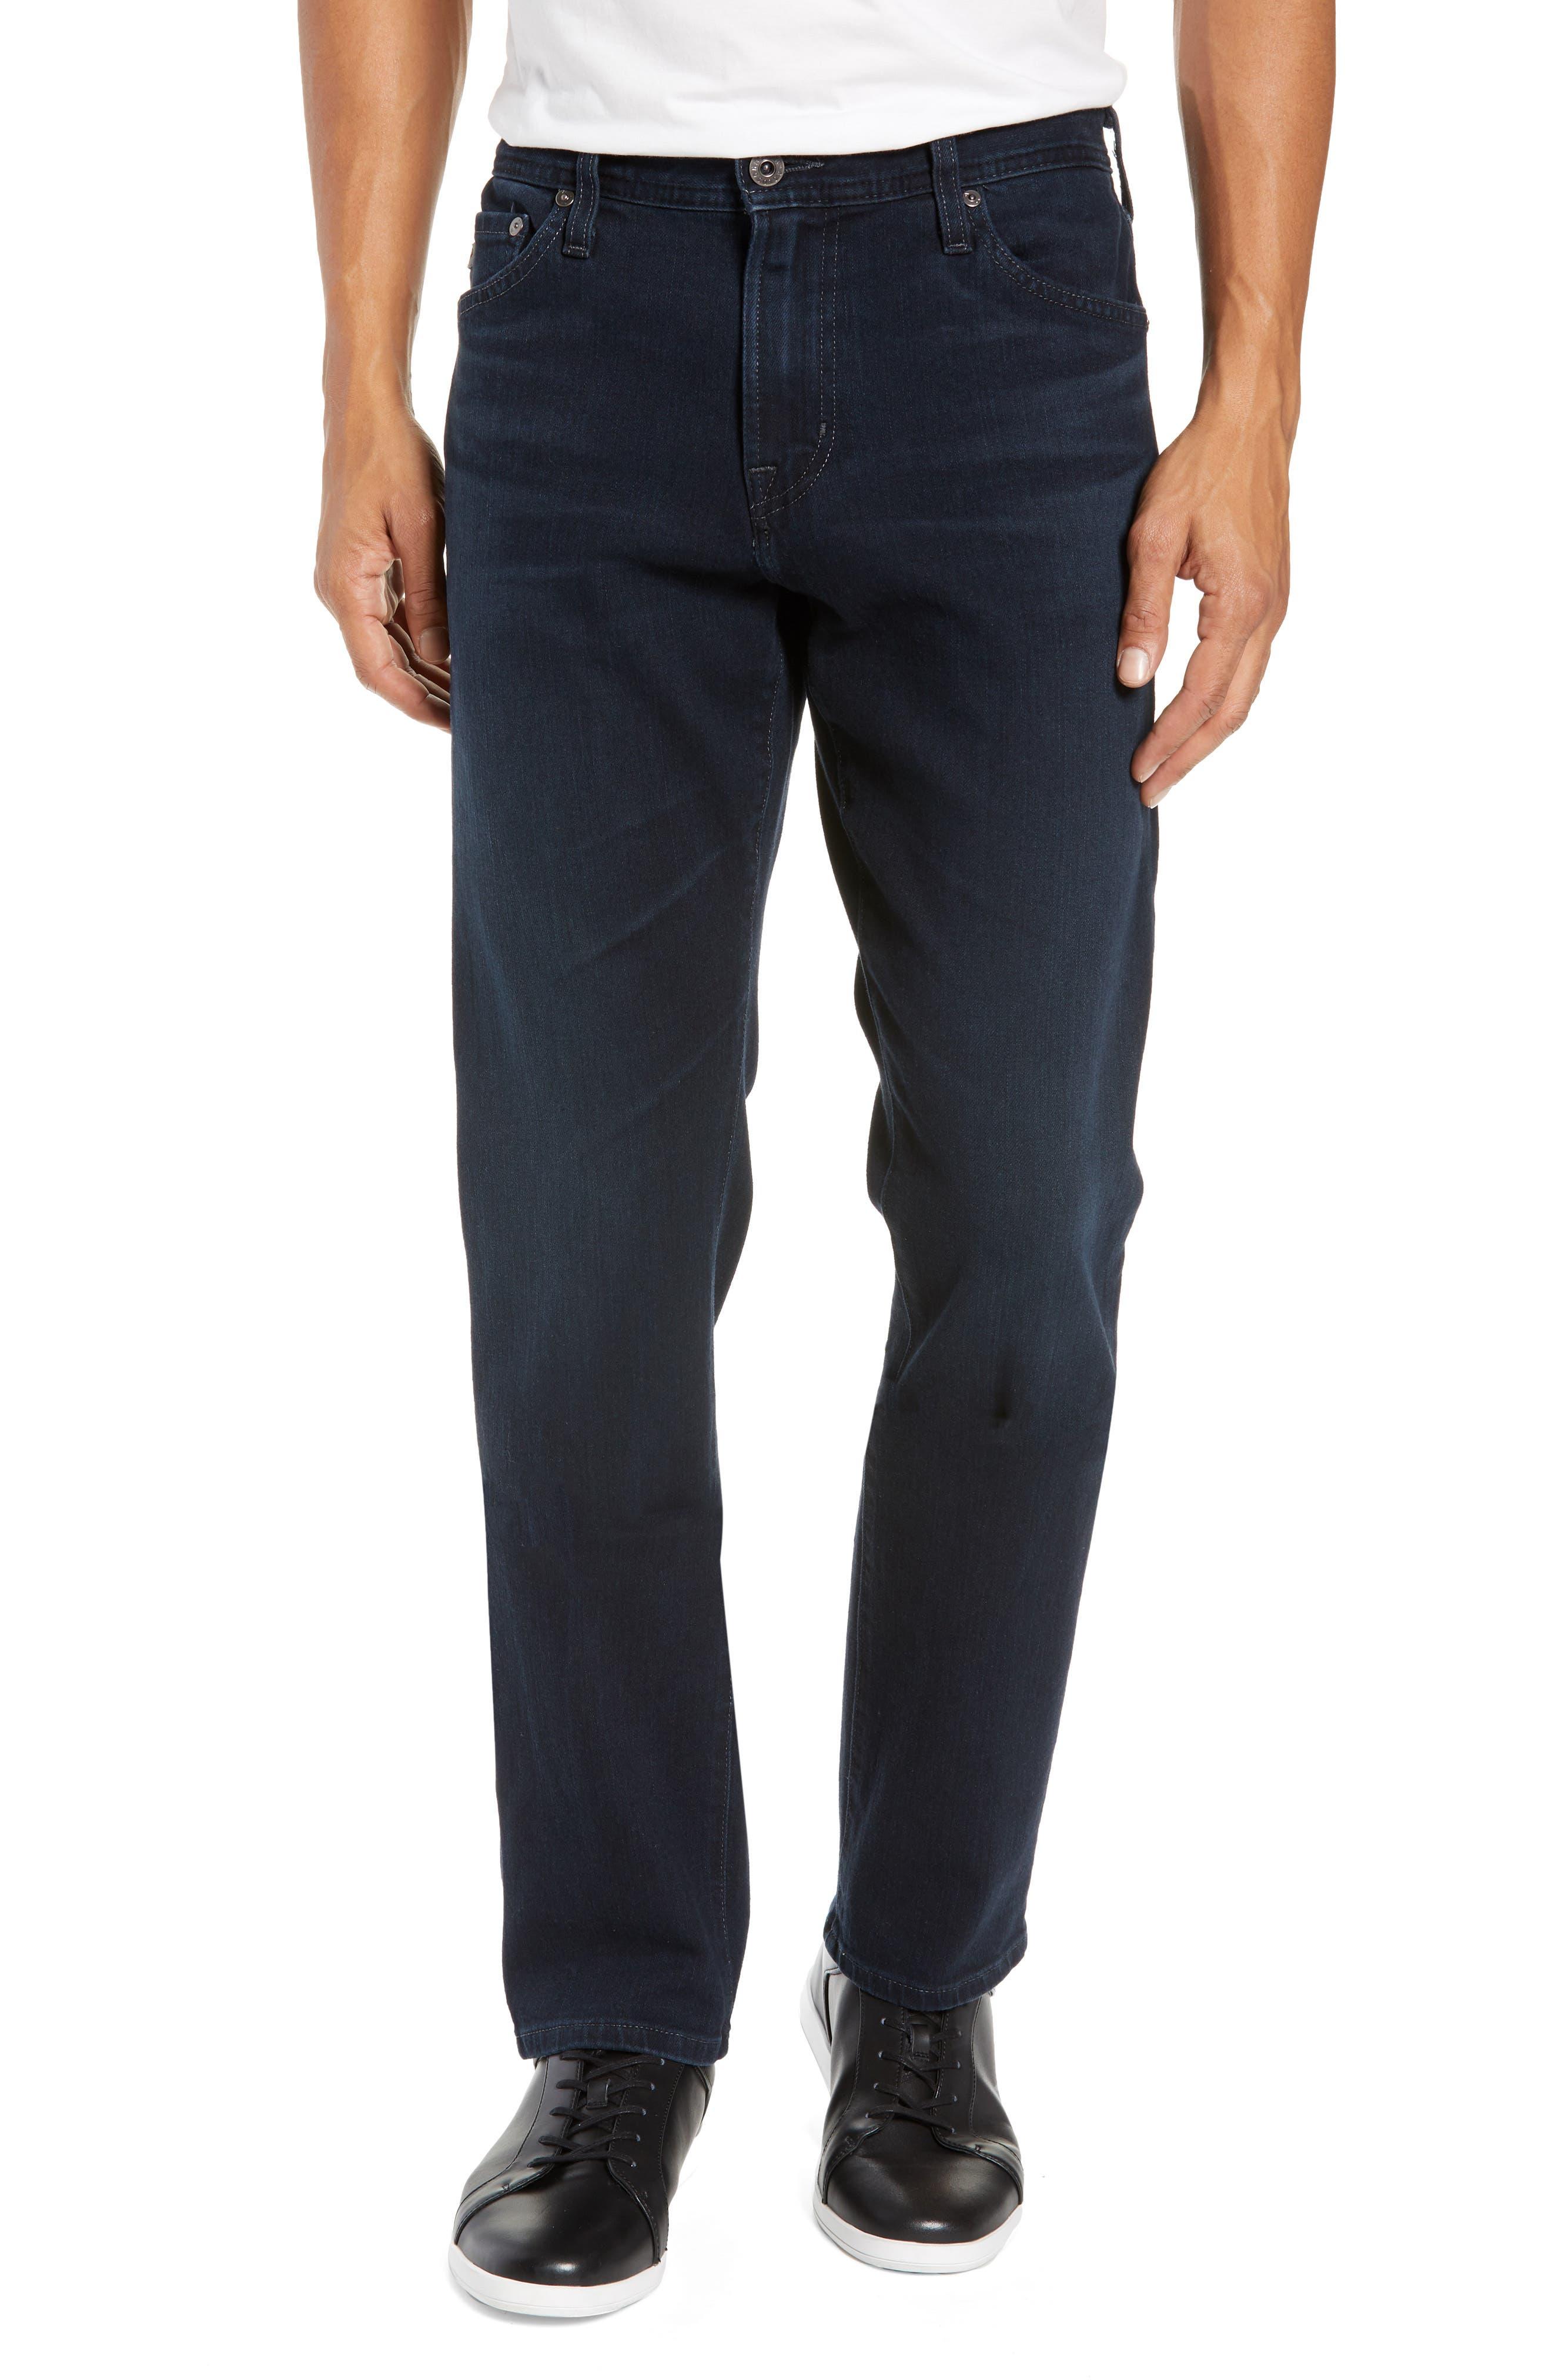 Everett Slim Straight Jeans,                         Main,                         color, ORISON